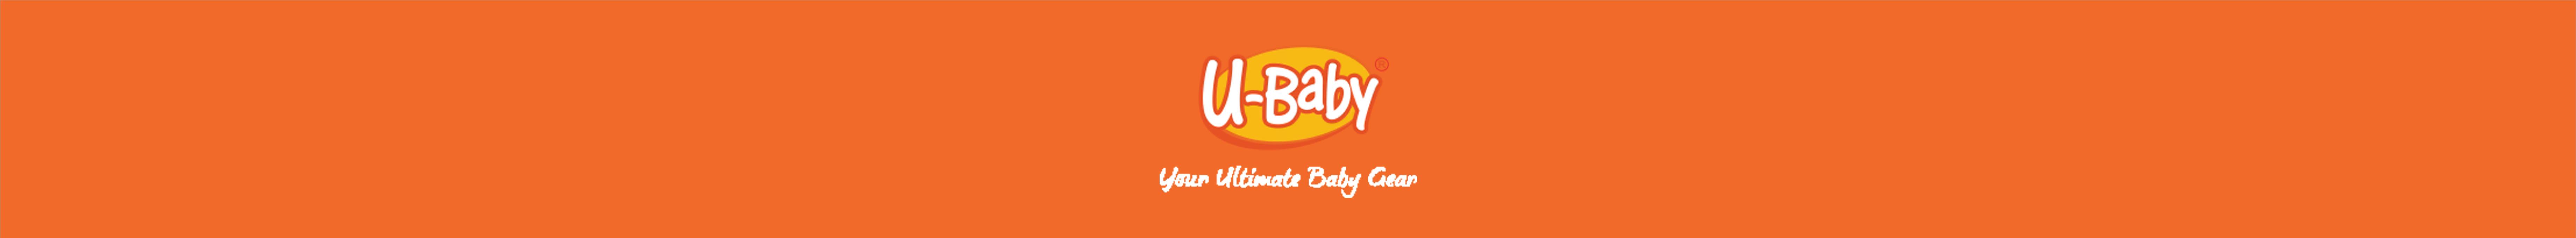 U-Baby PRO logo bar-01